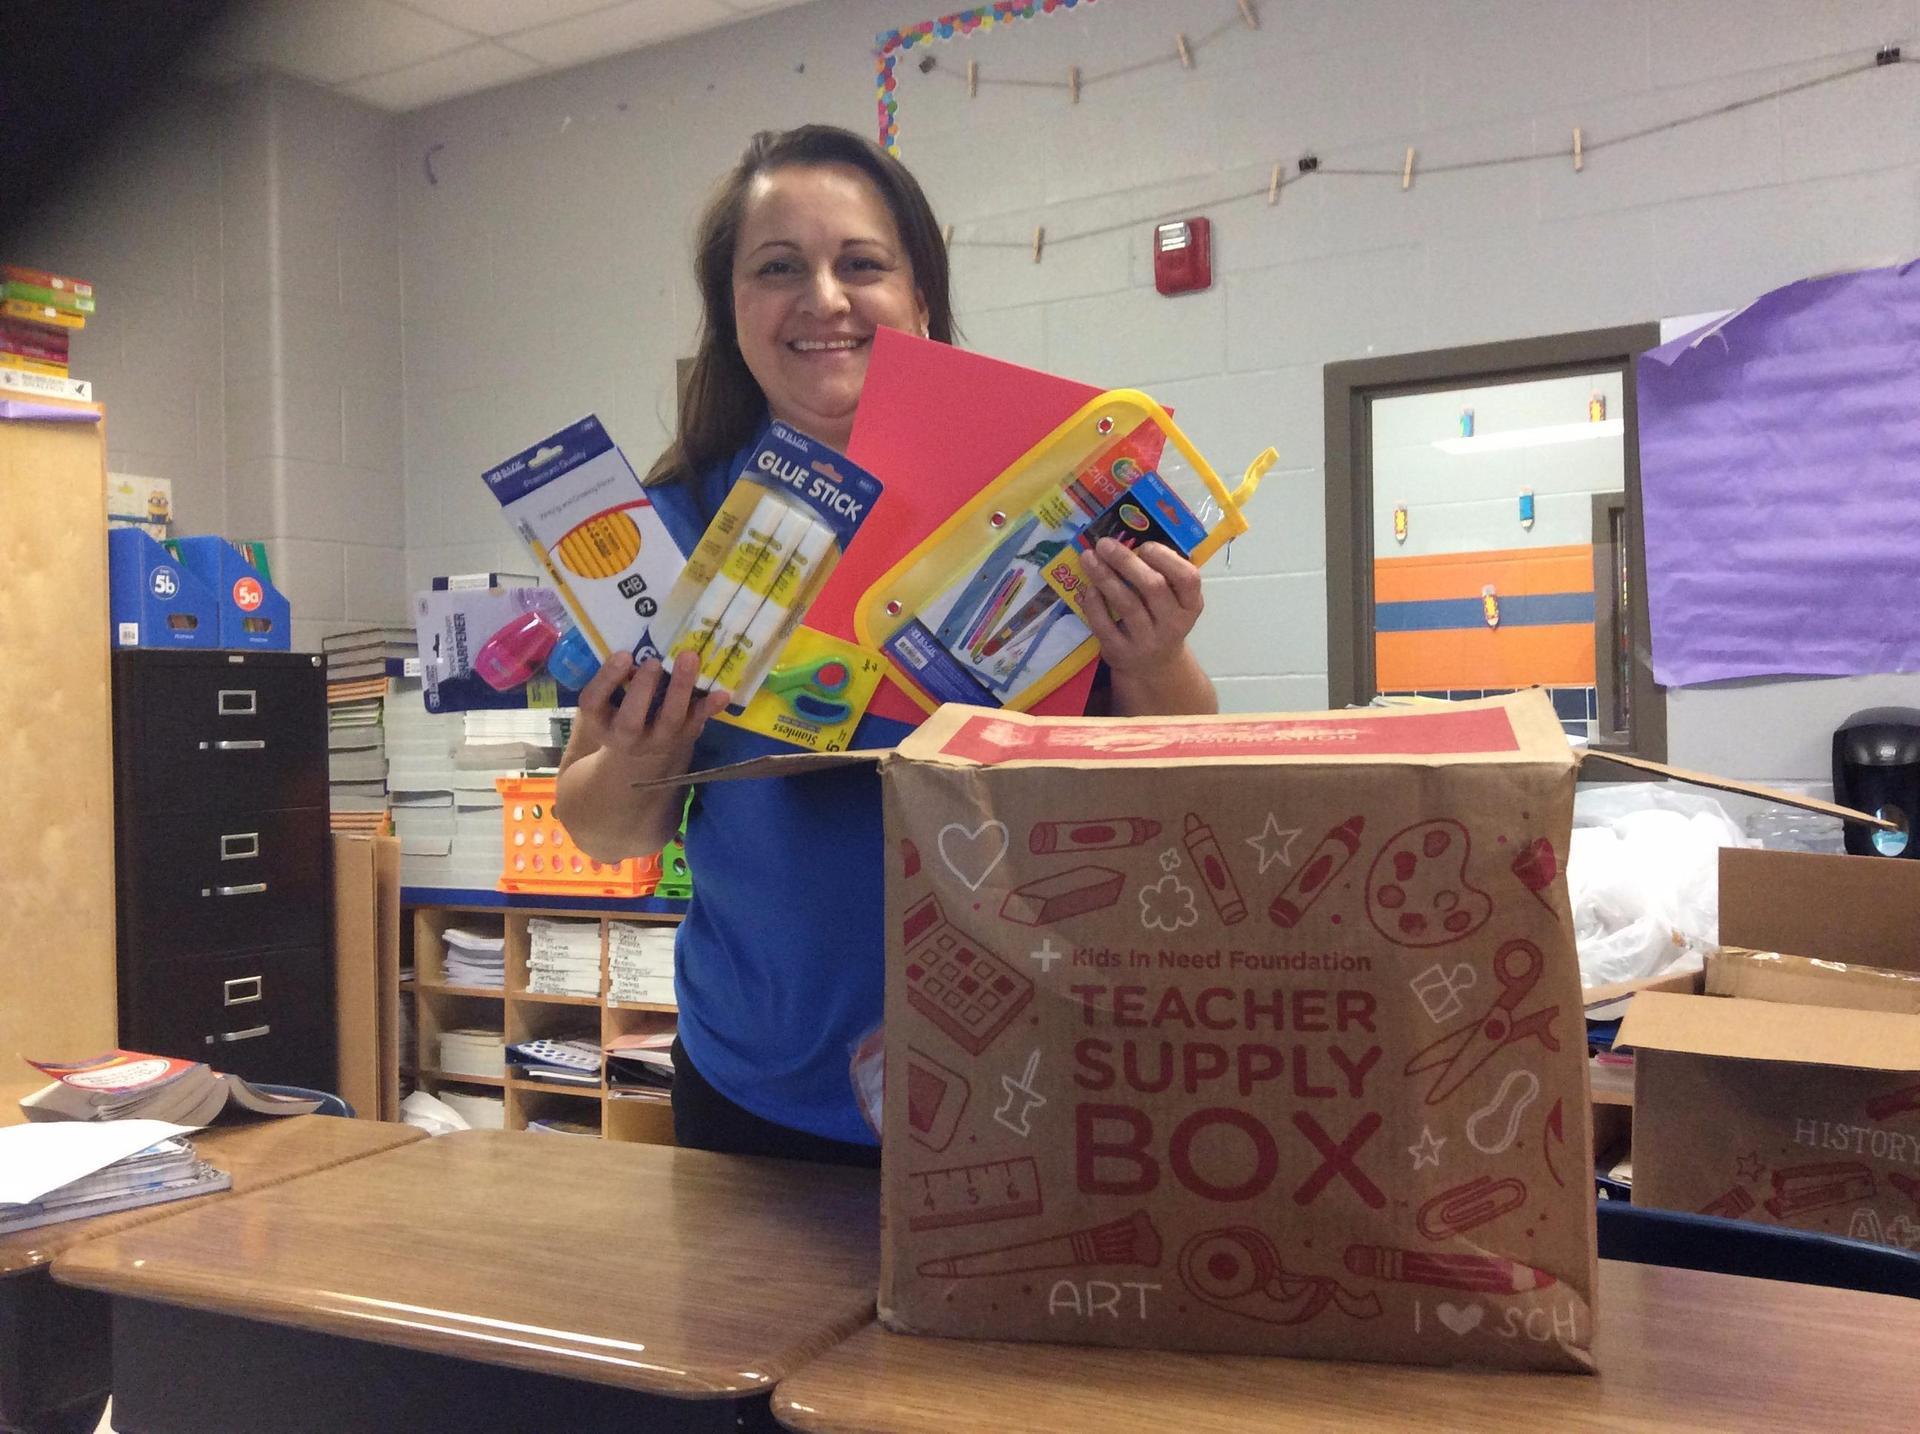 Image of Mrs. Guzman receiving school supplies for Gorena Elementary